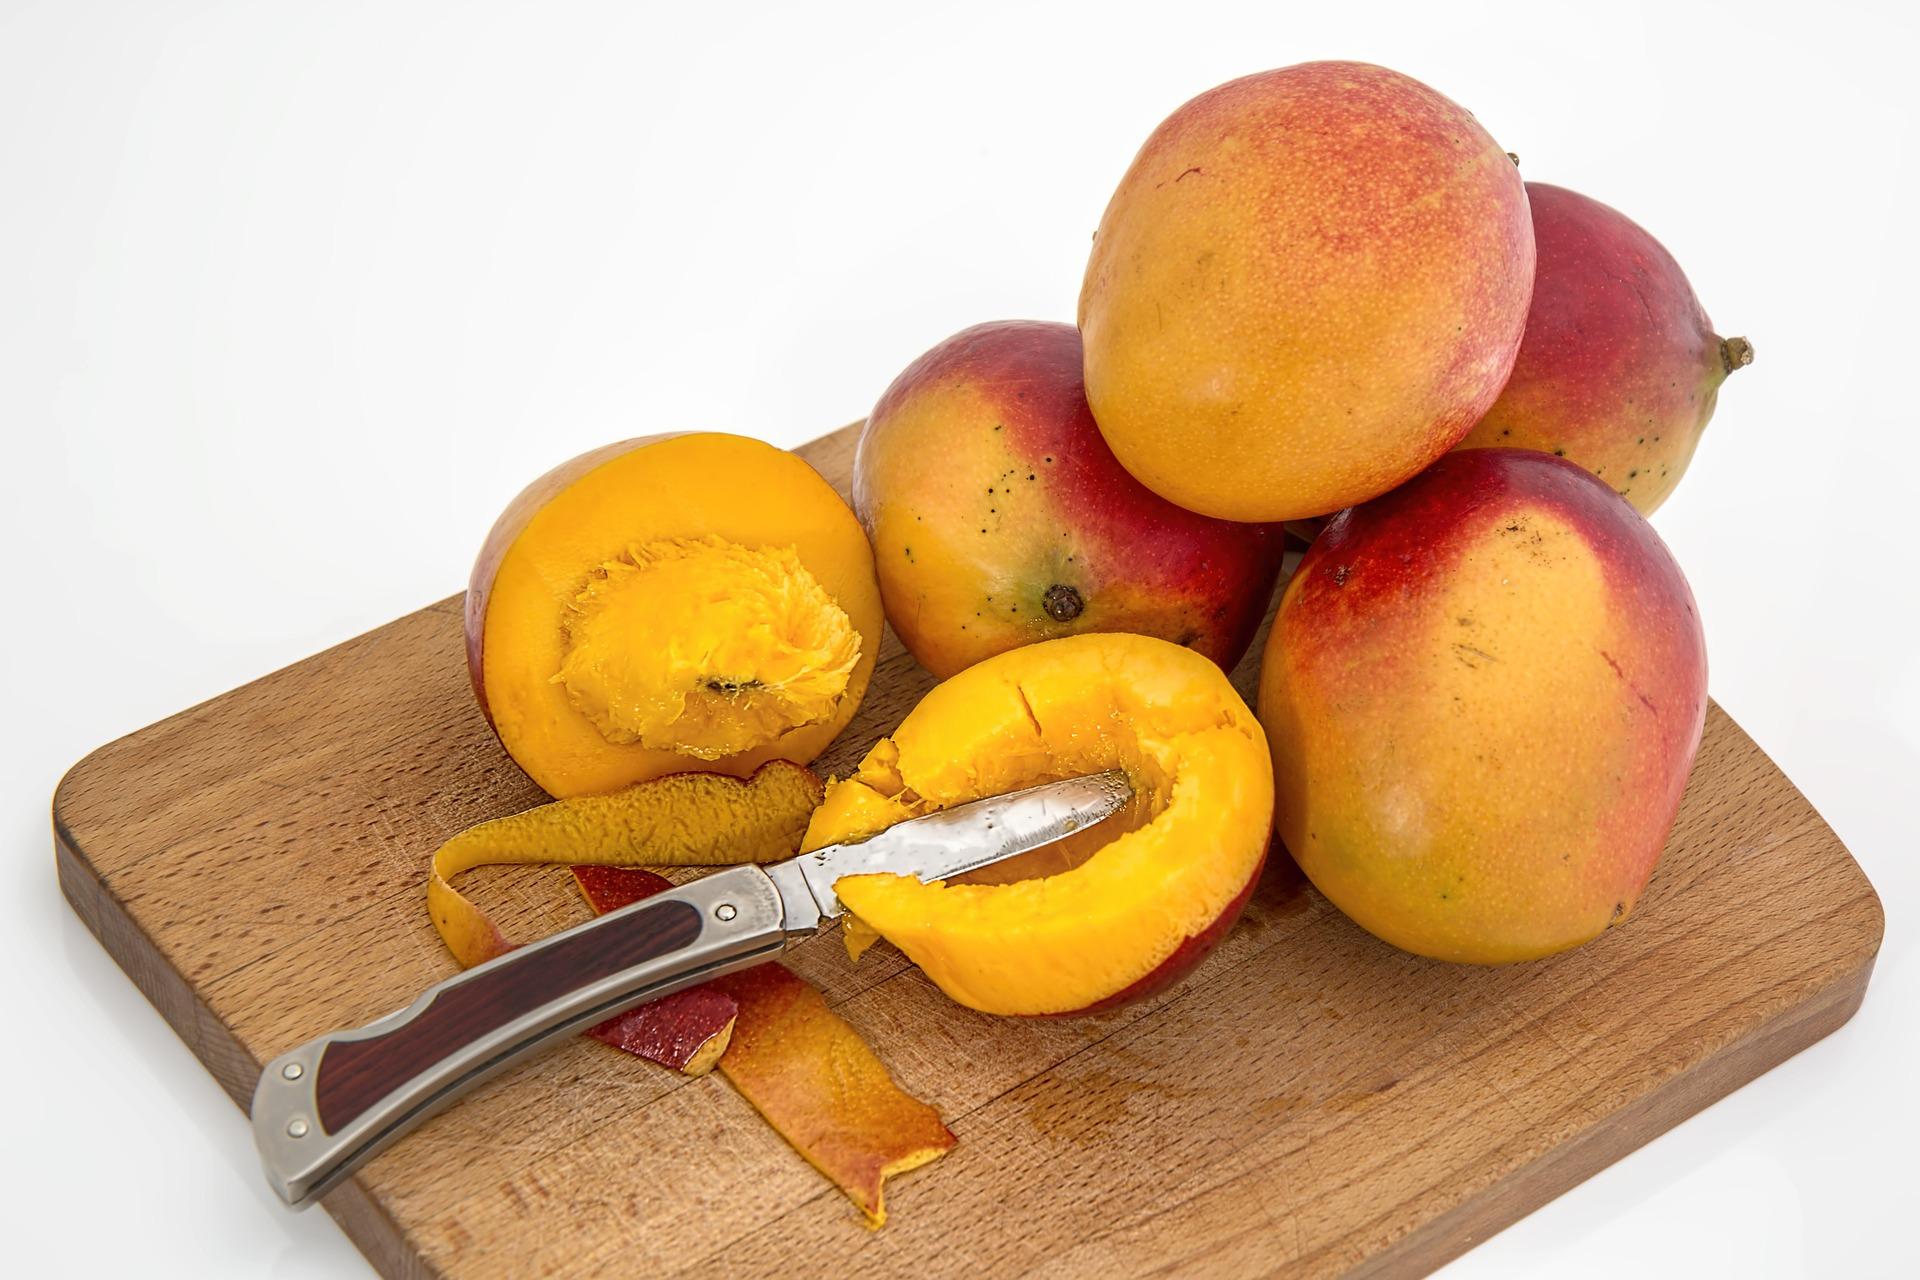 Mango can cause a rare food allergy